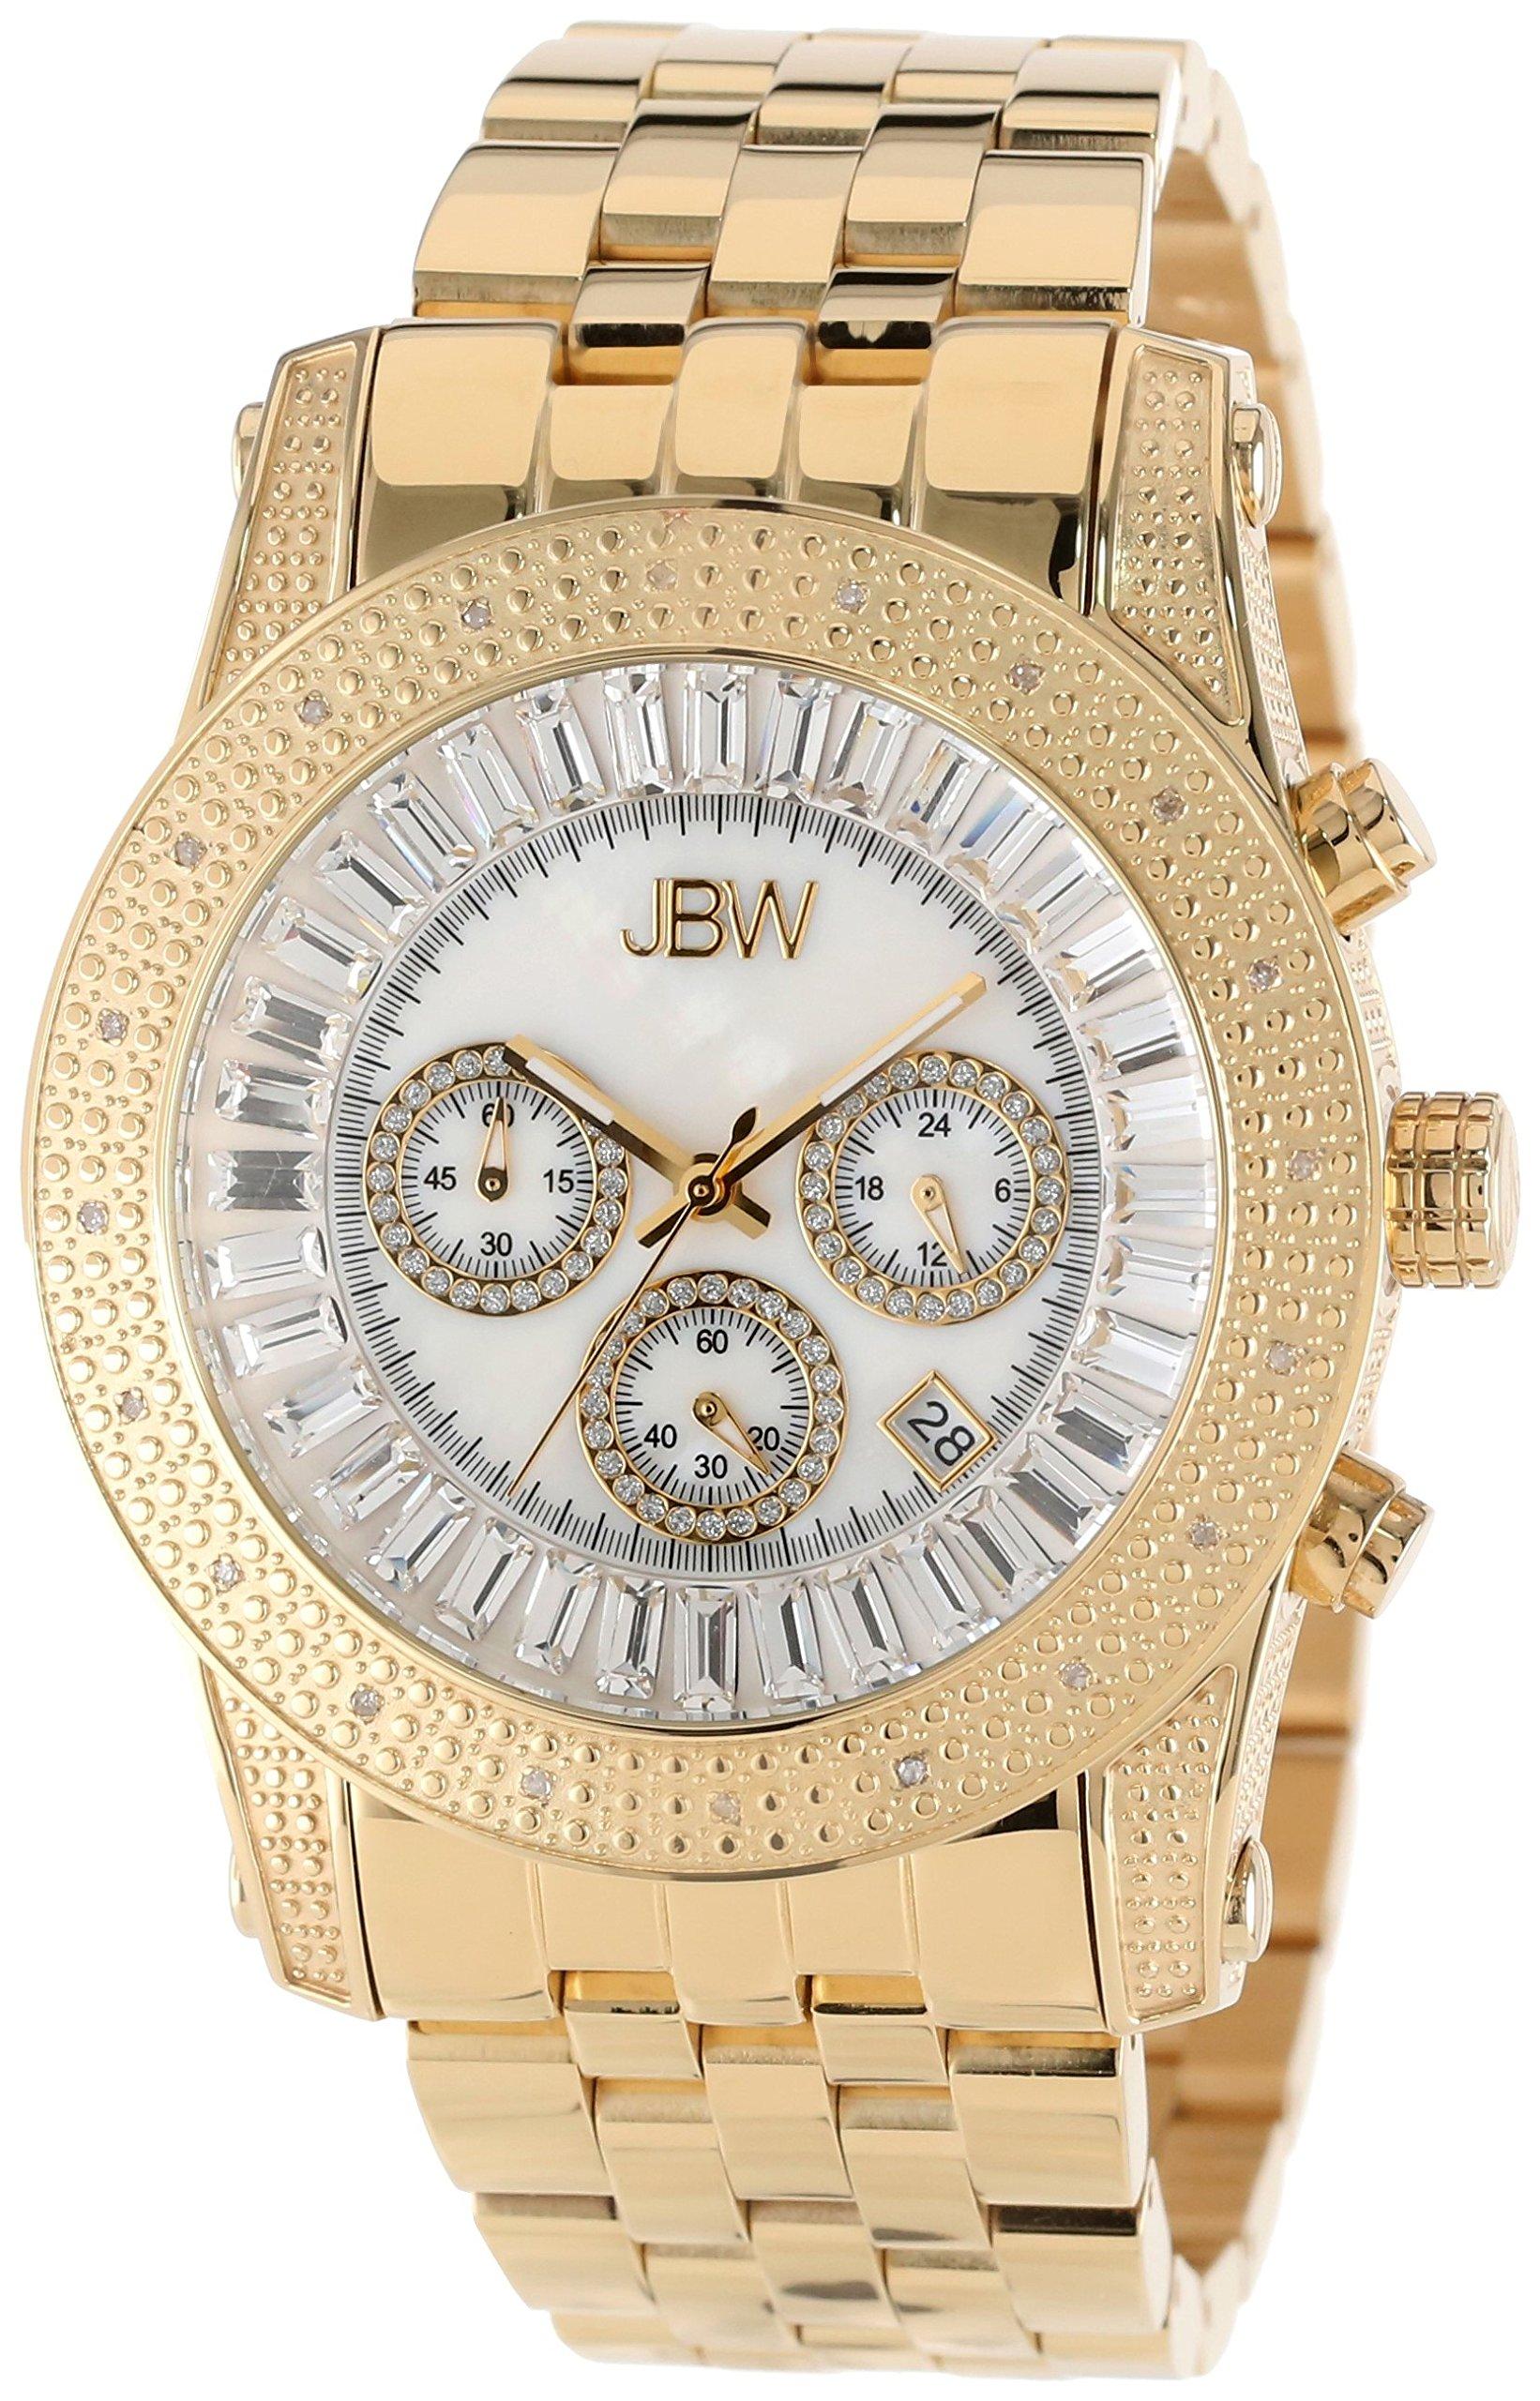 "Jbw Men's Jb-6219-F ""Krypton"" Gold Chronograph Diamond Watch 8"